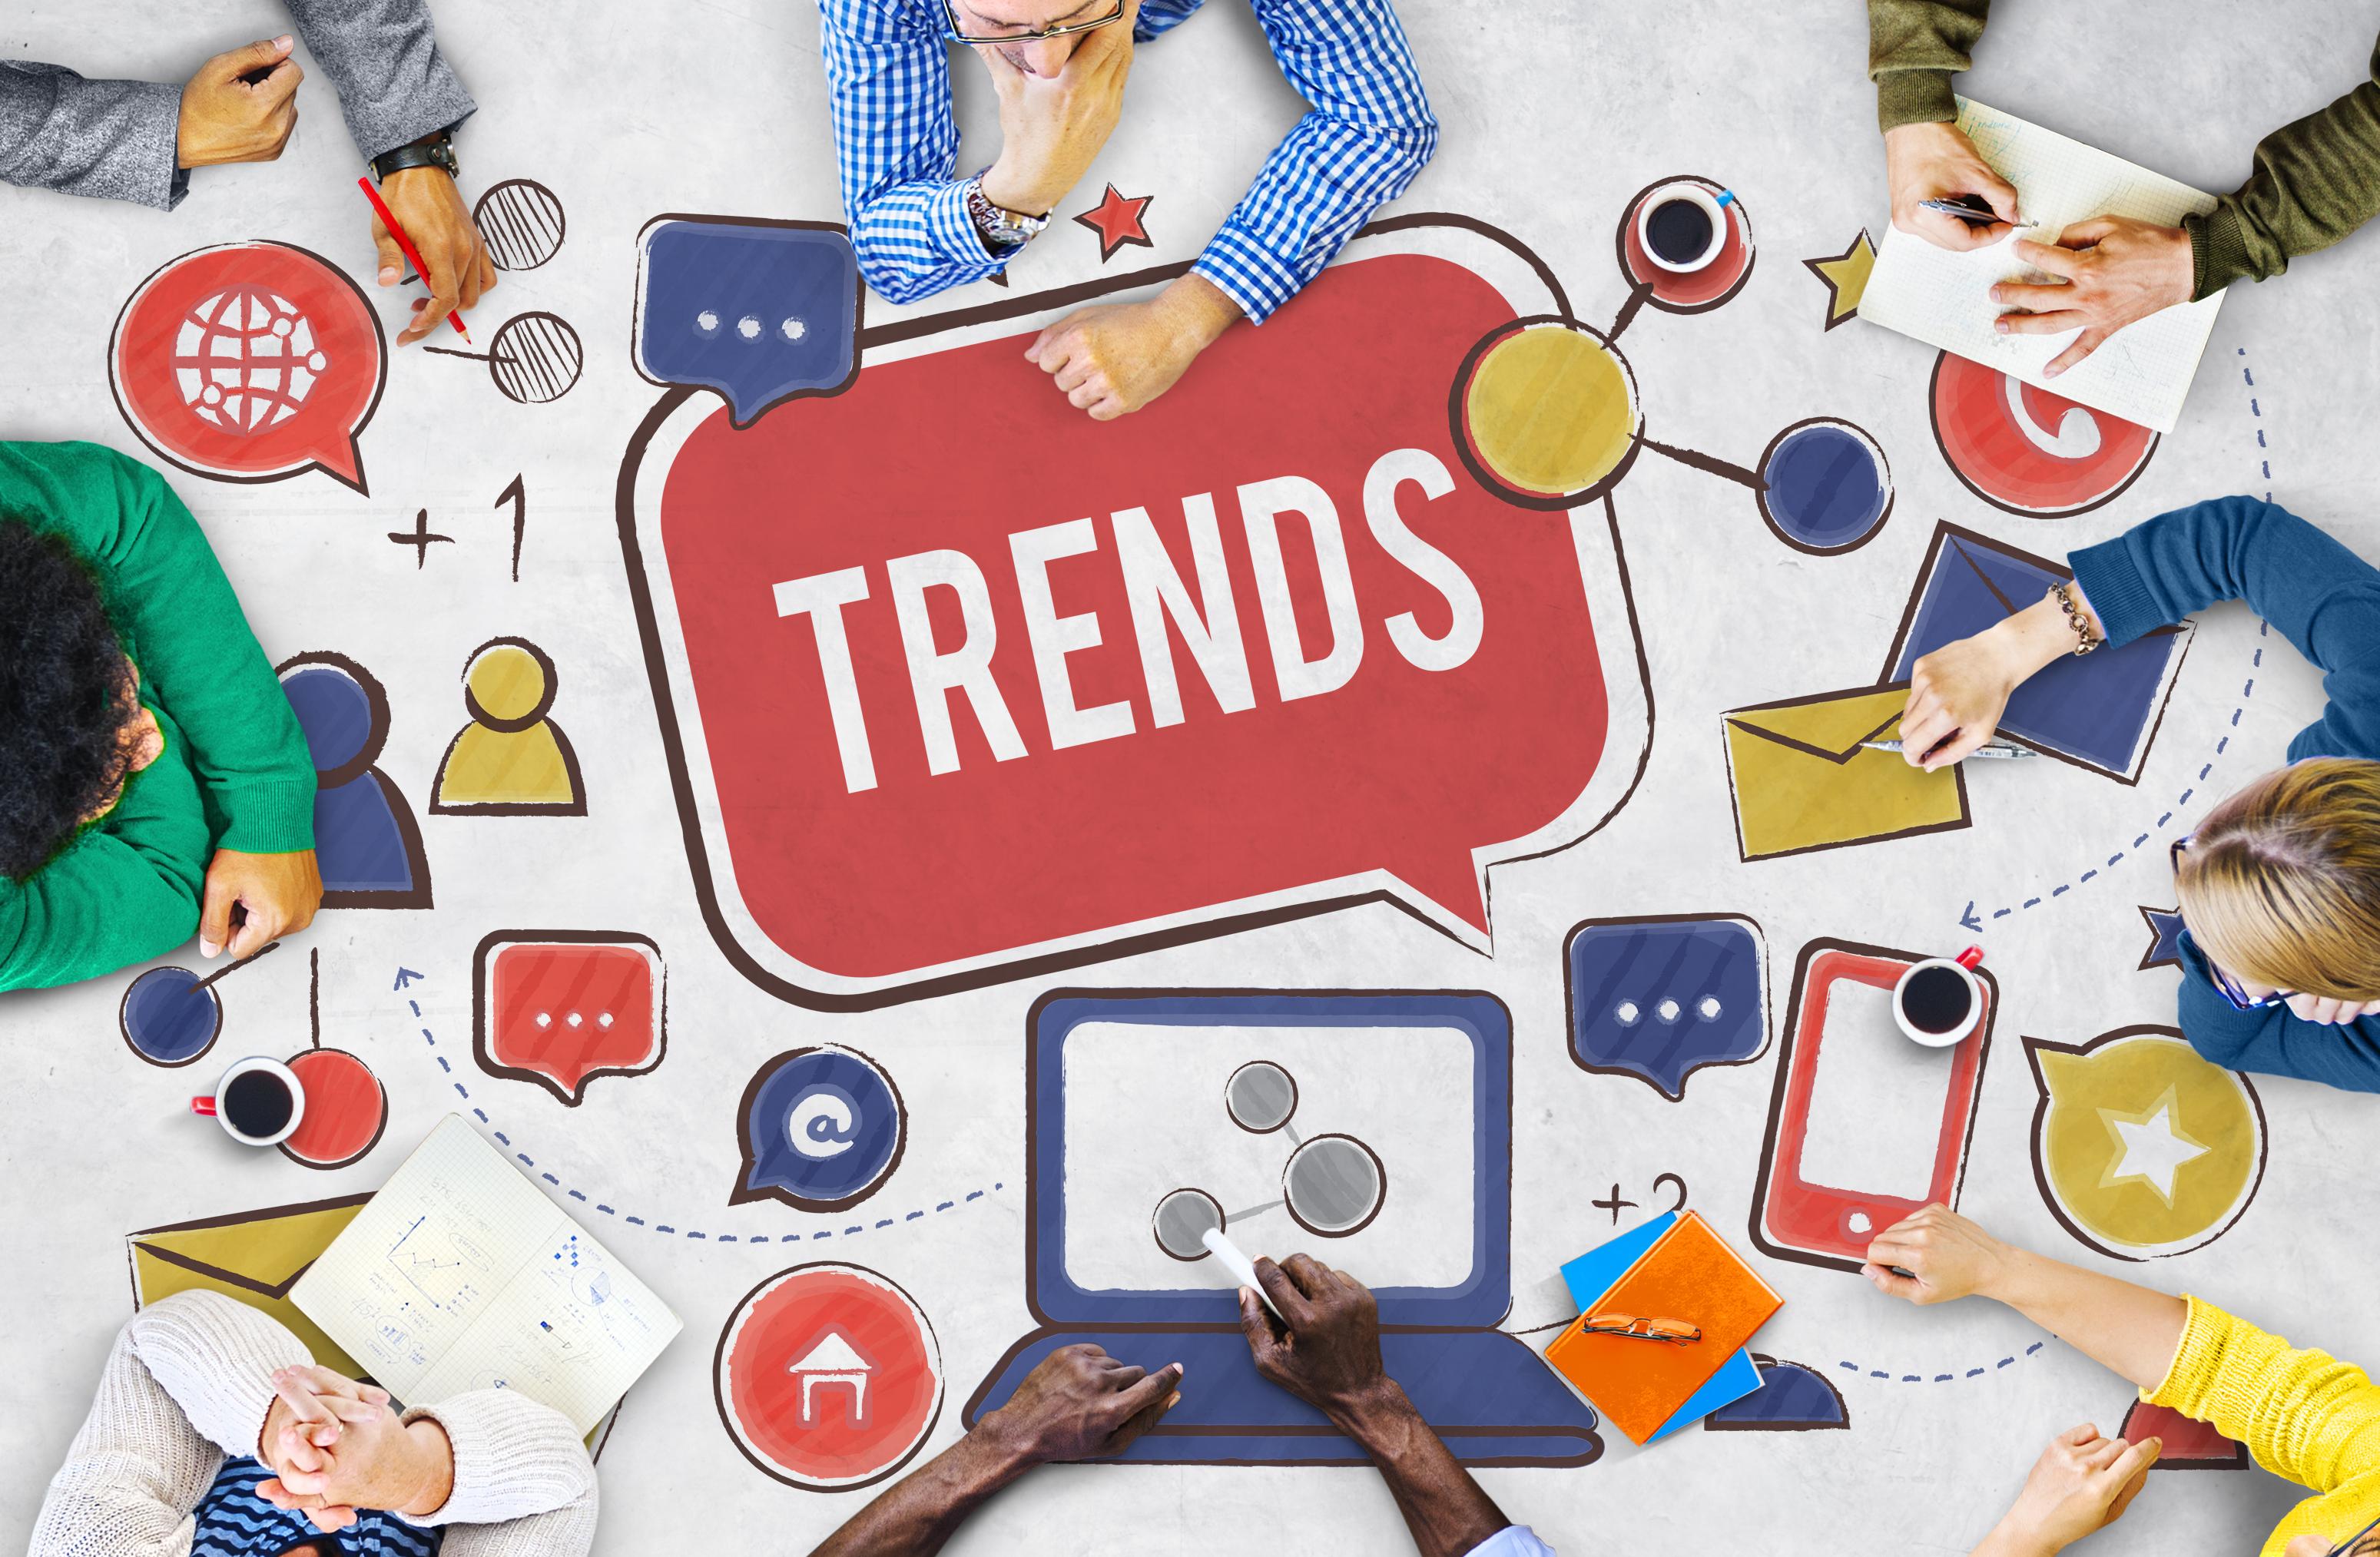 social-trends.jpg